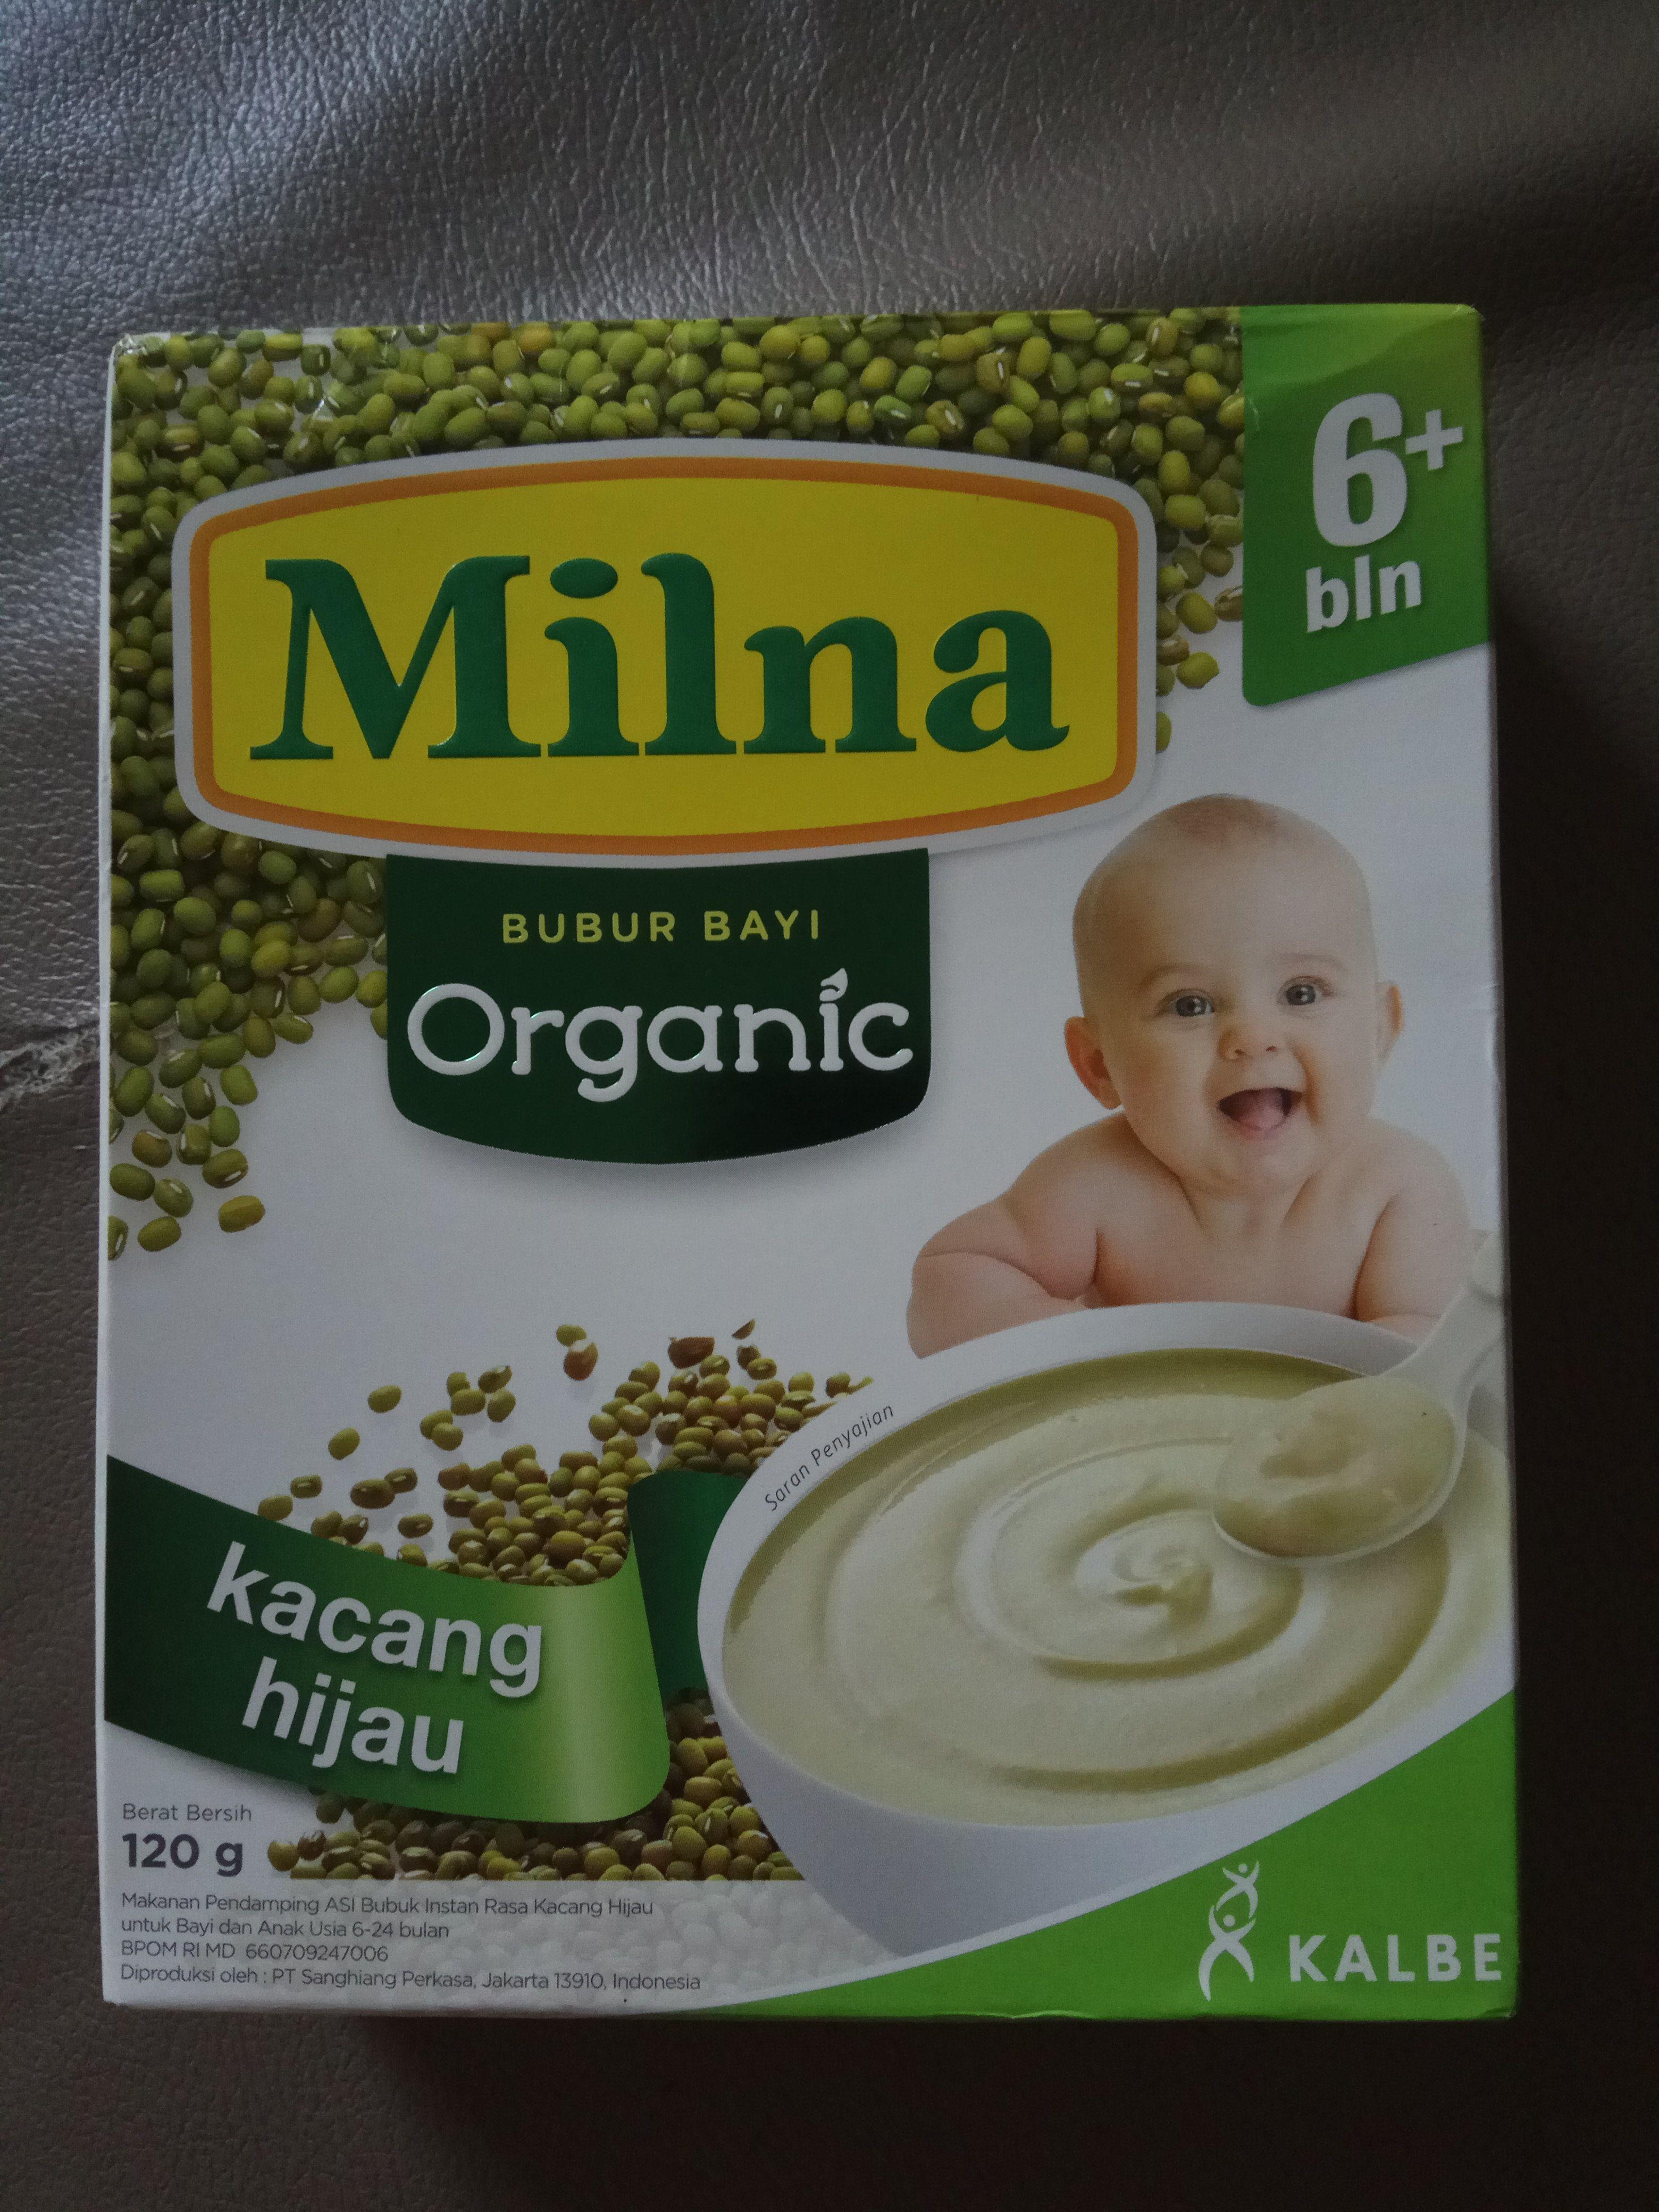 gambar review ke-1 untuk Milna Bubur Bayi Organic 6+ bln - Kacang Hijau